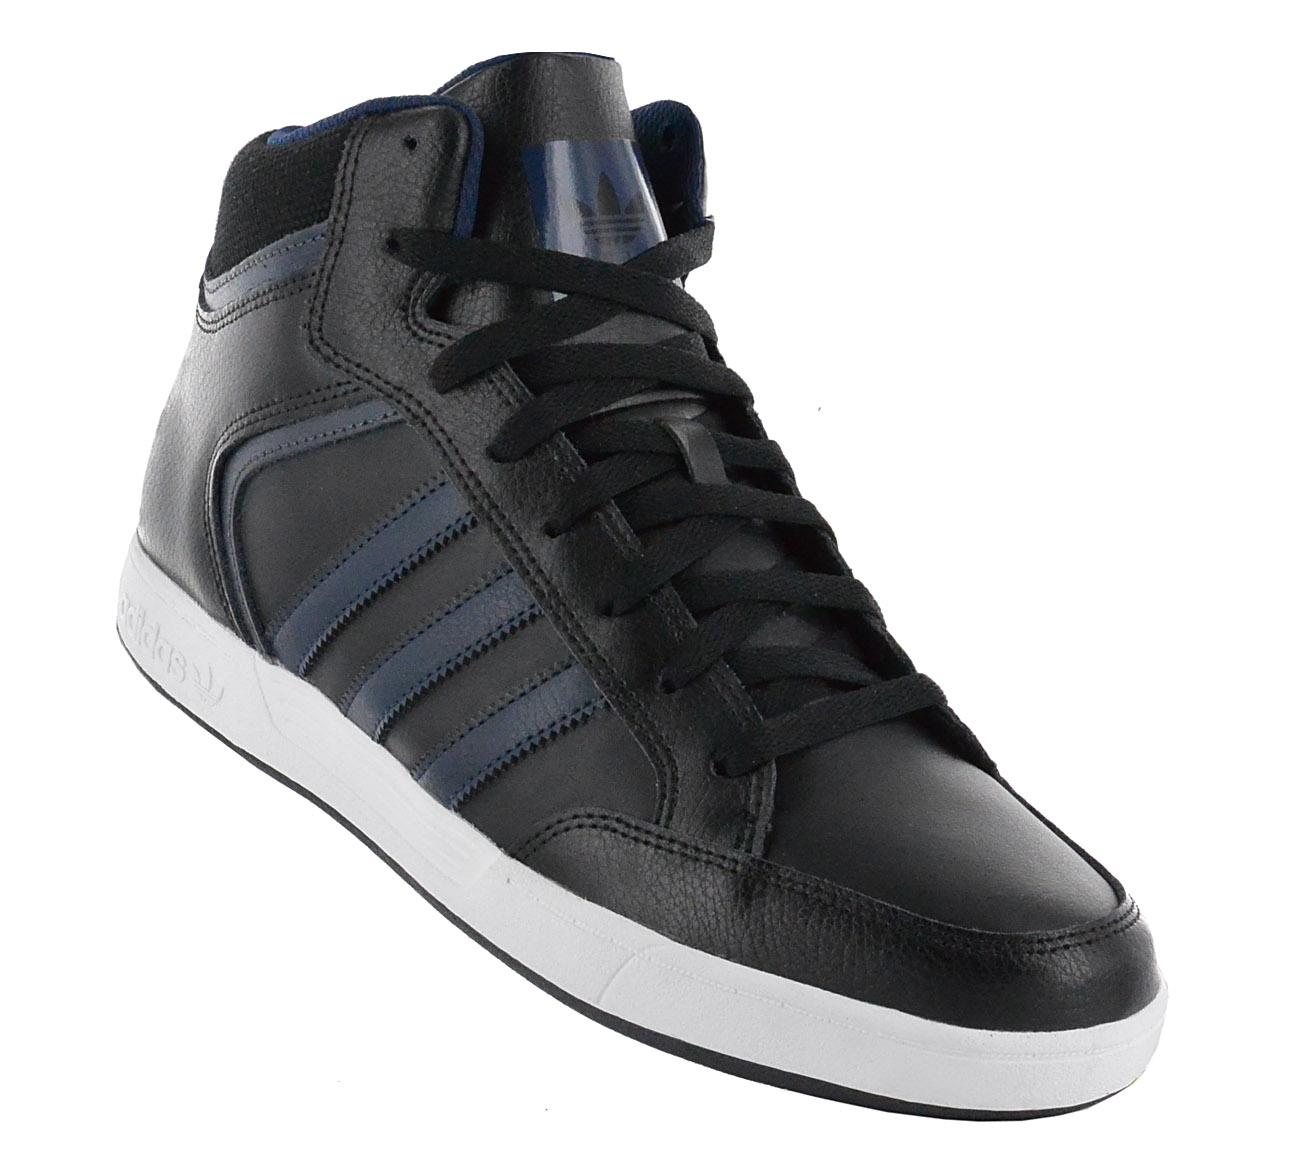 adidas originals mens varial mid leather skateboarding shoes nz